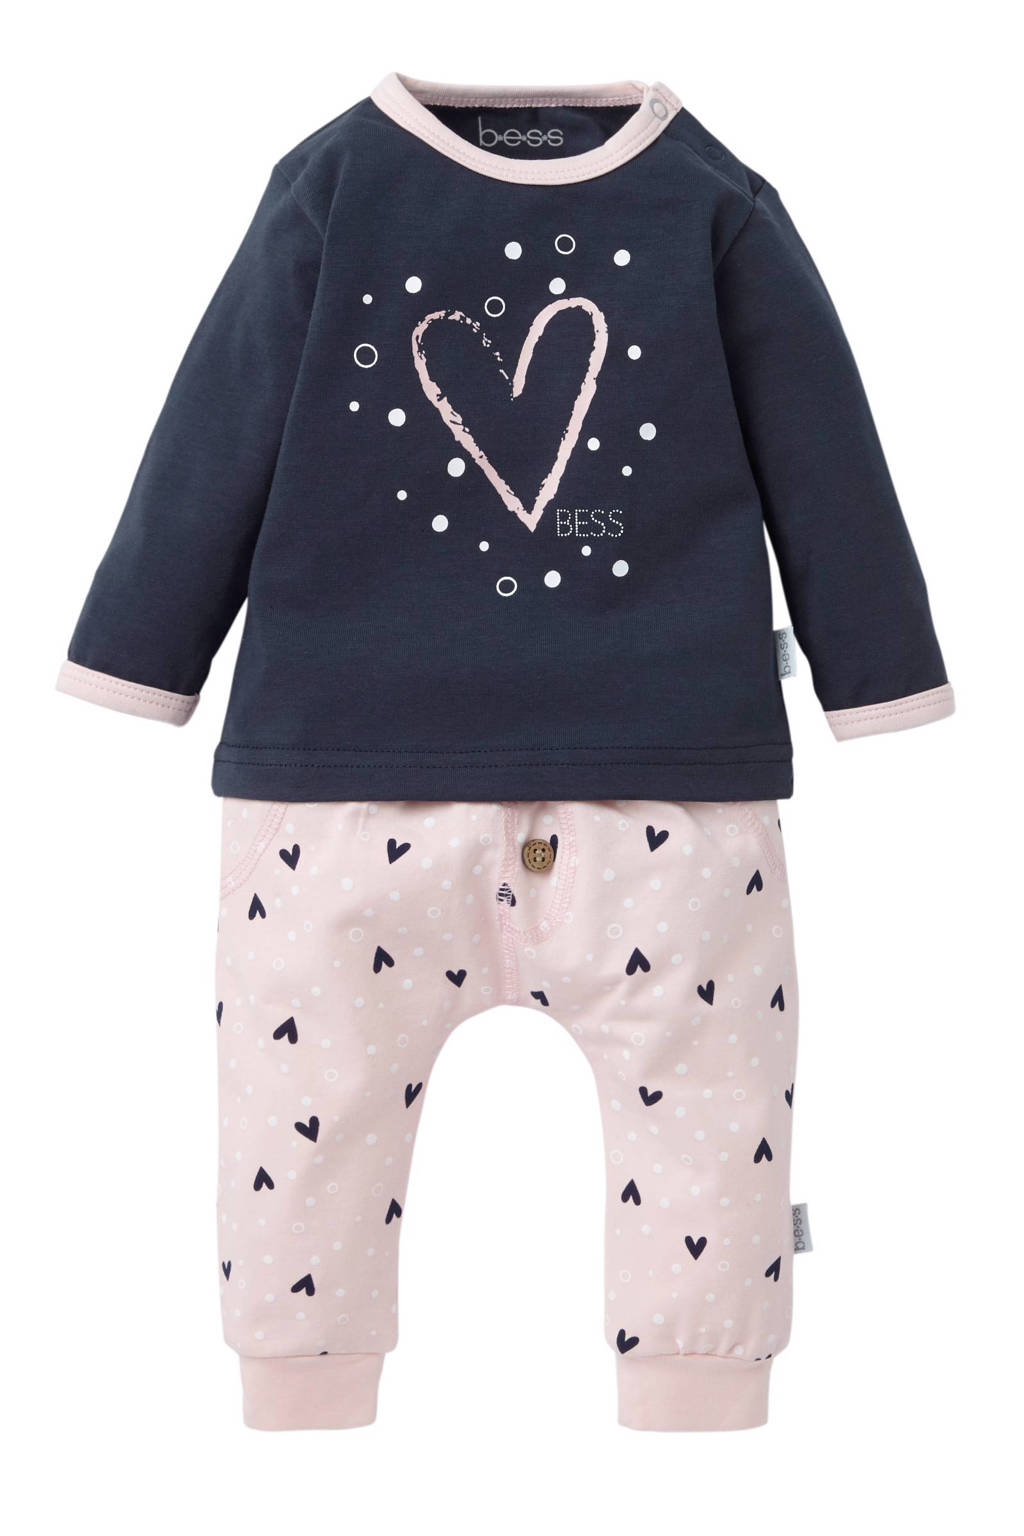 B.E.S.S newborn baby pyjama - set van 2, Roze